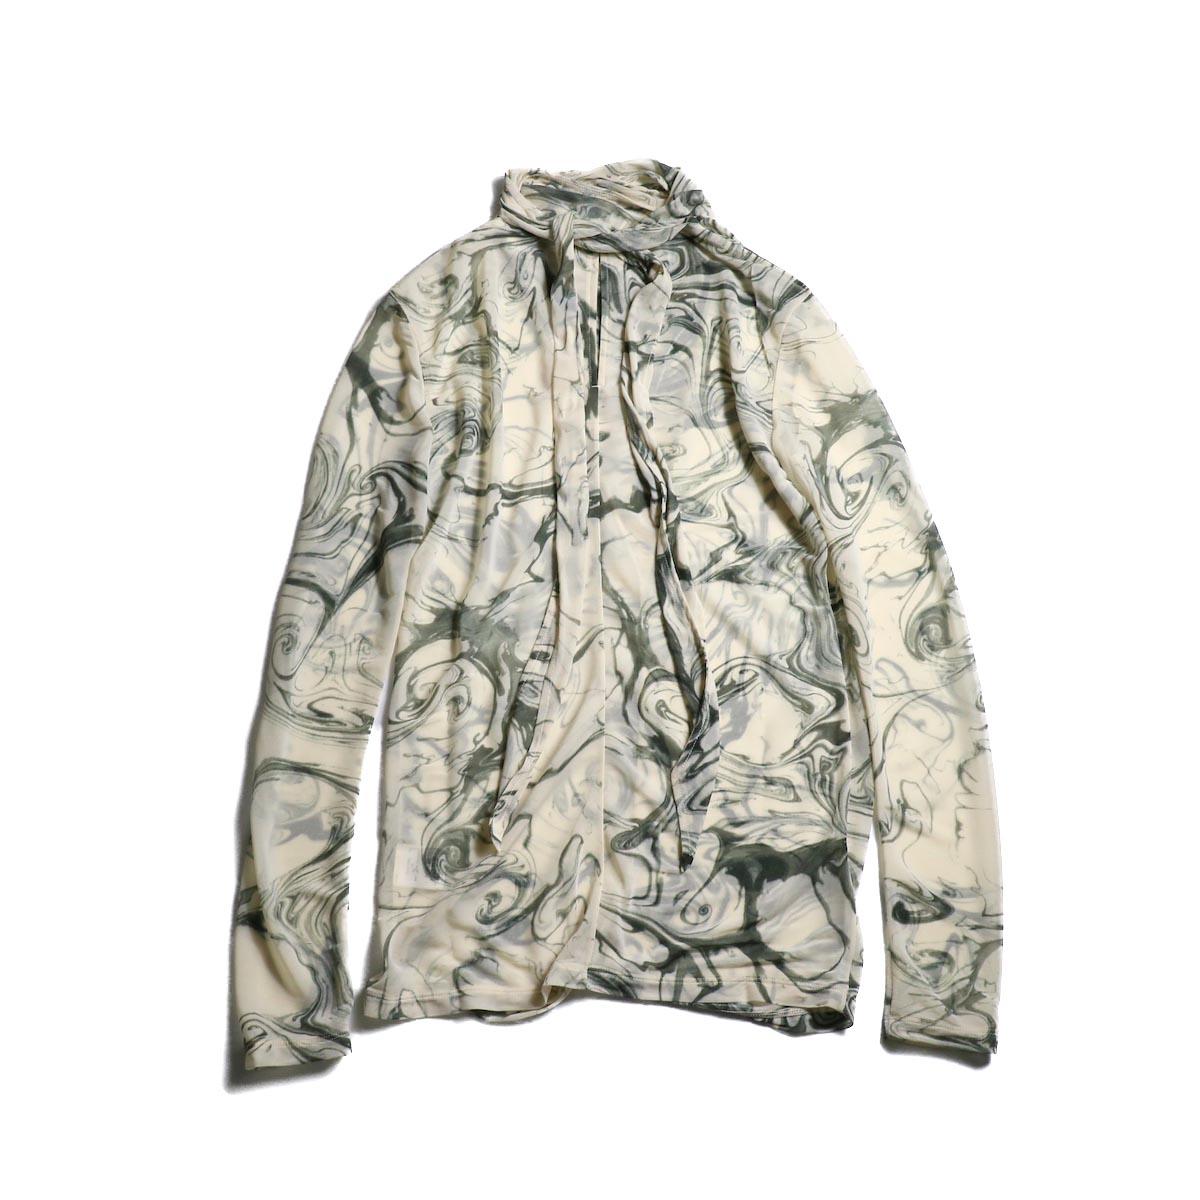 FUMIKA UCHIDA / Japan Marble Print Tie Blouse 背面